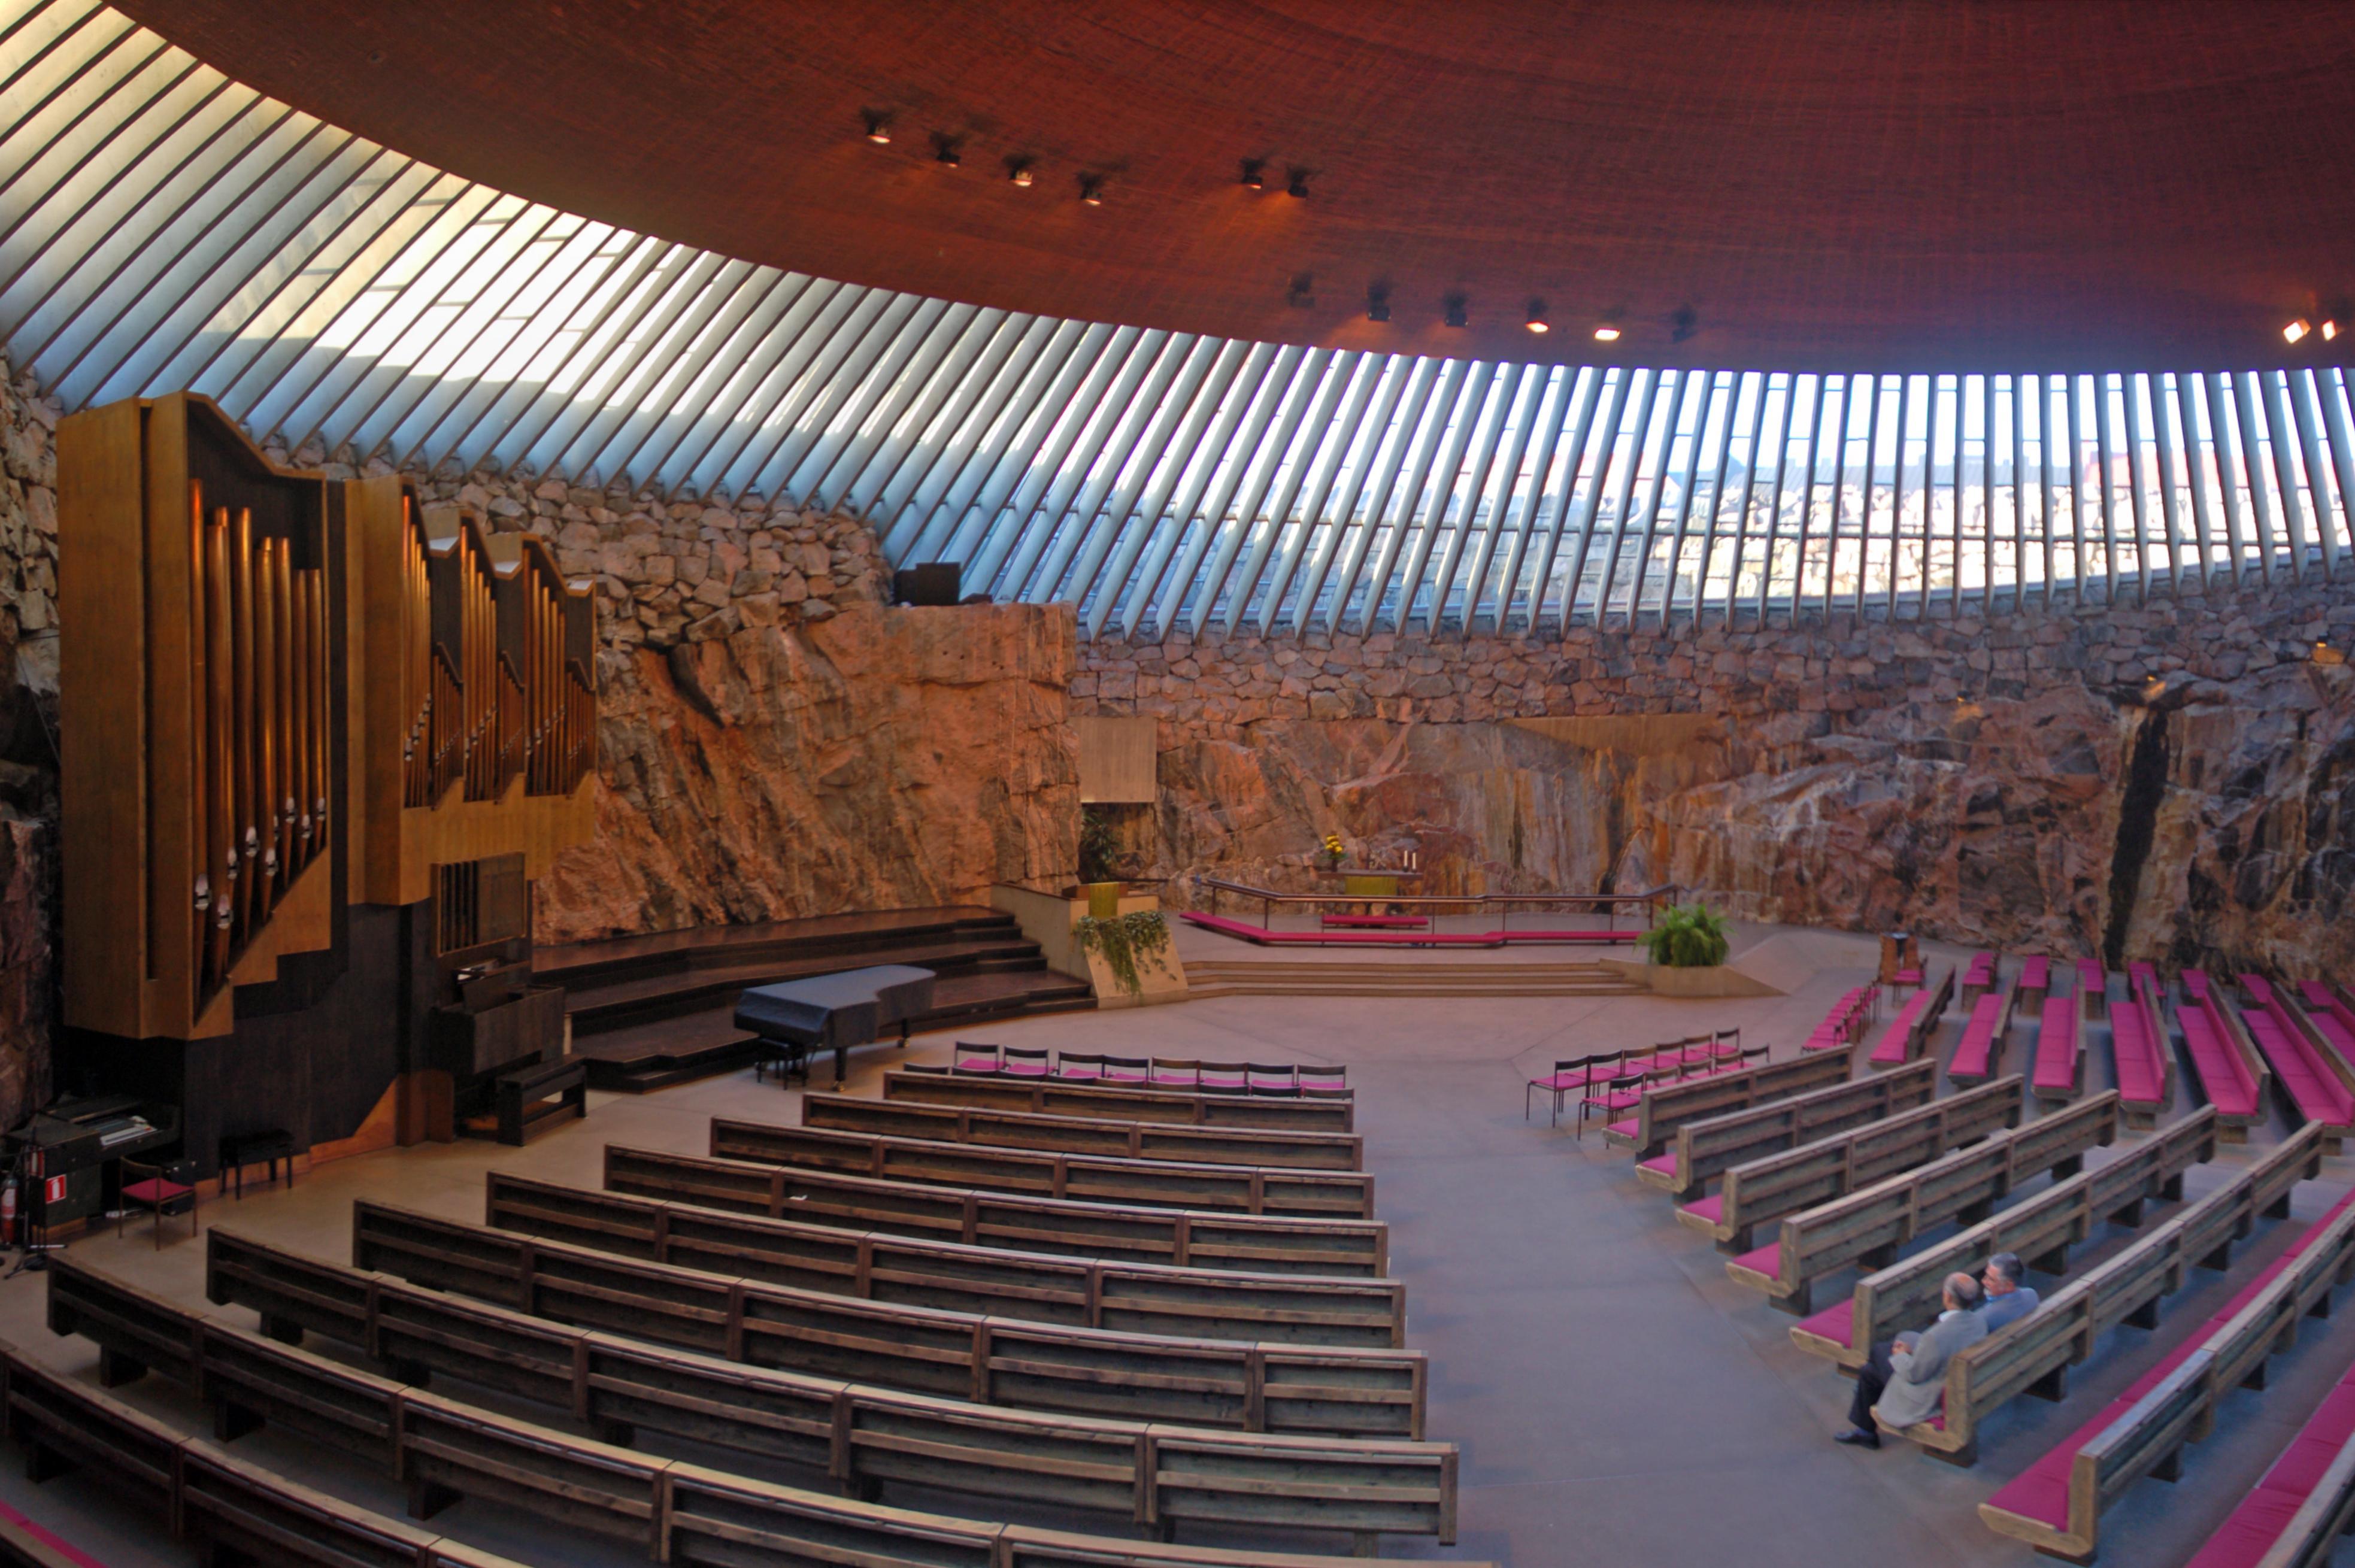 temppeliaukio-helsinki-by-ralfr-1.jpg